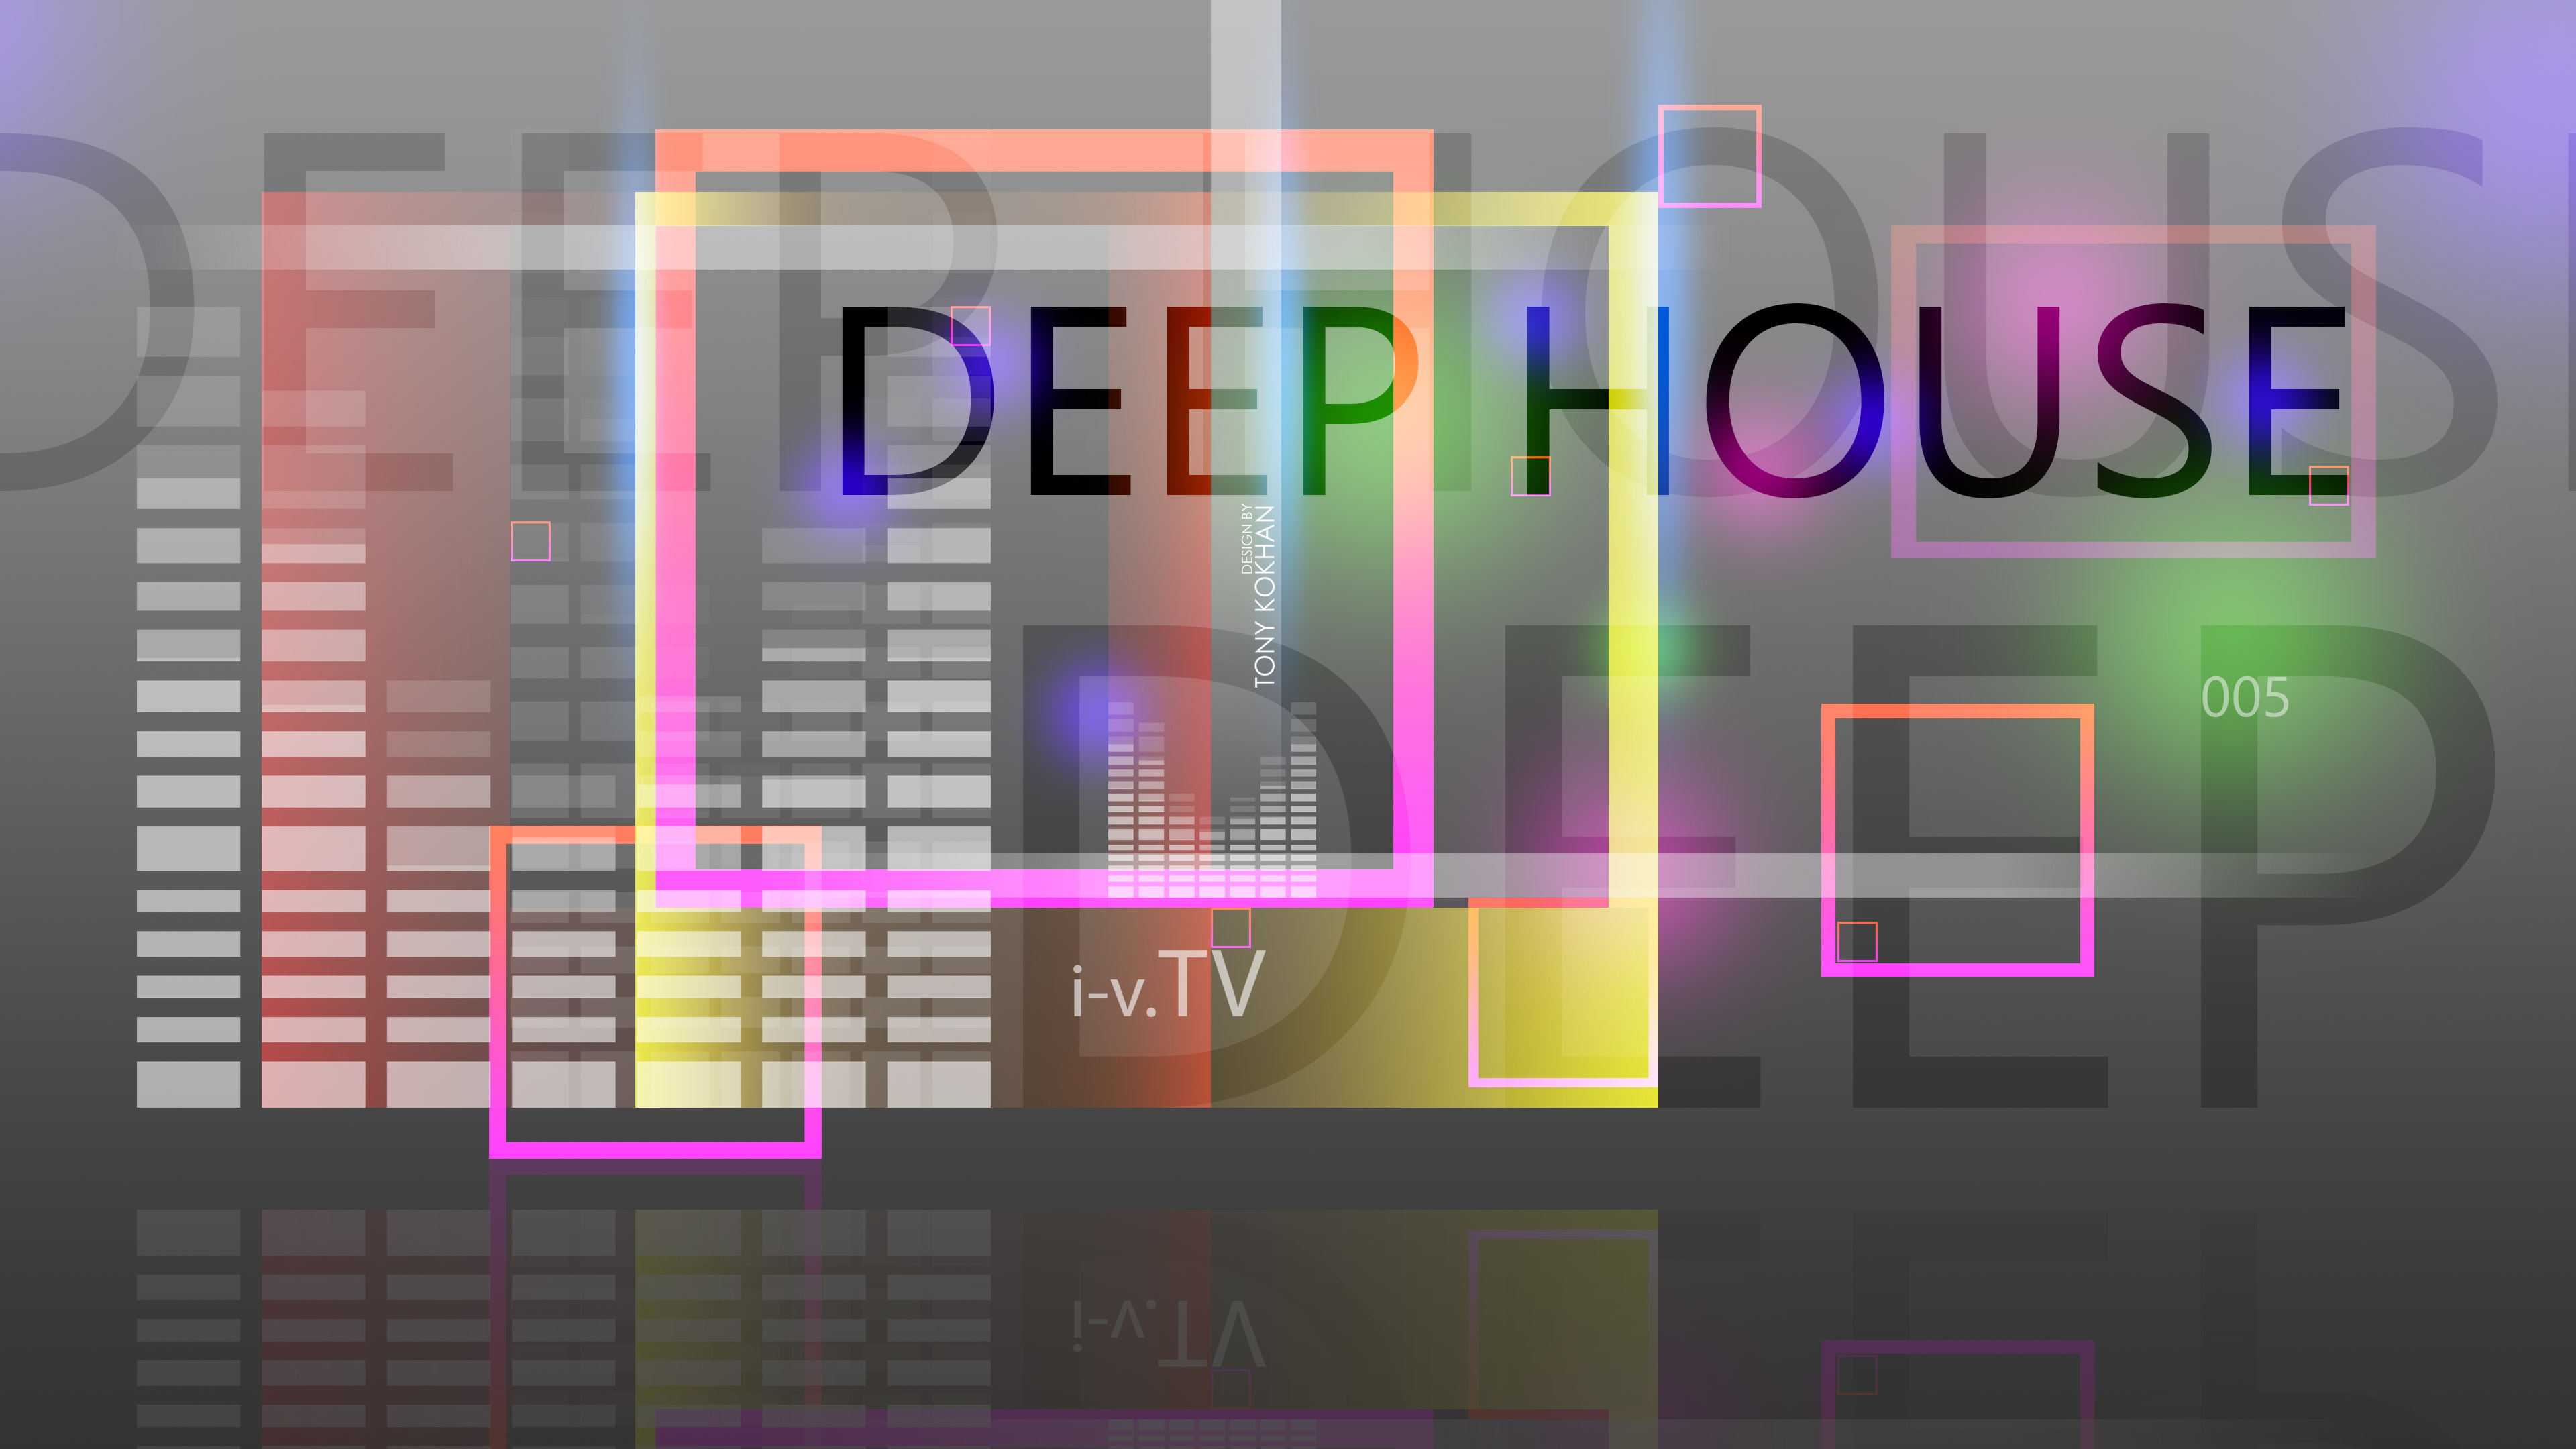 Deep House Music eQ Simple Creative Five Abstract Words 3840x2160